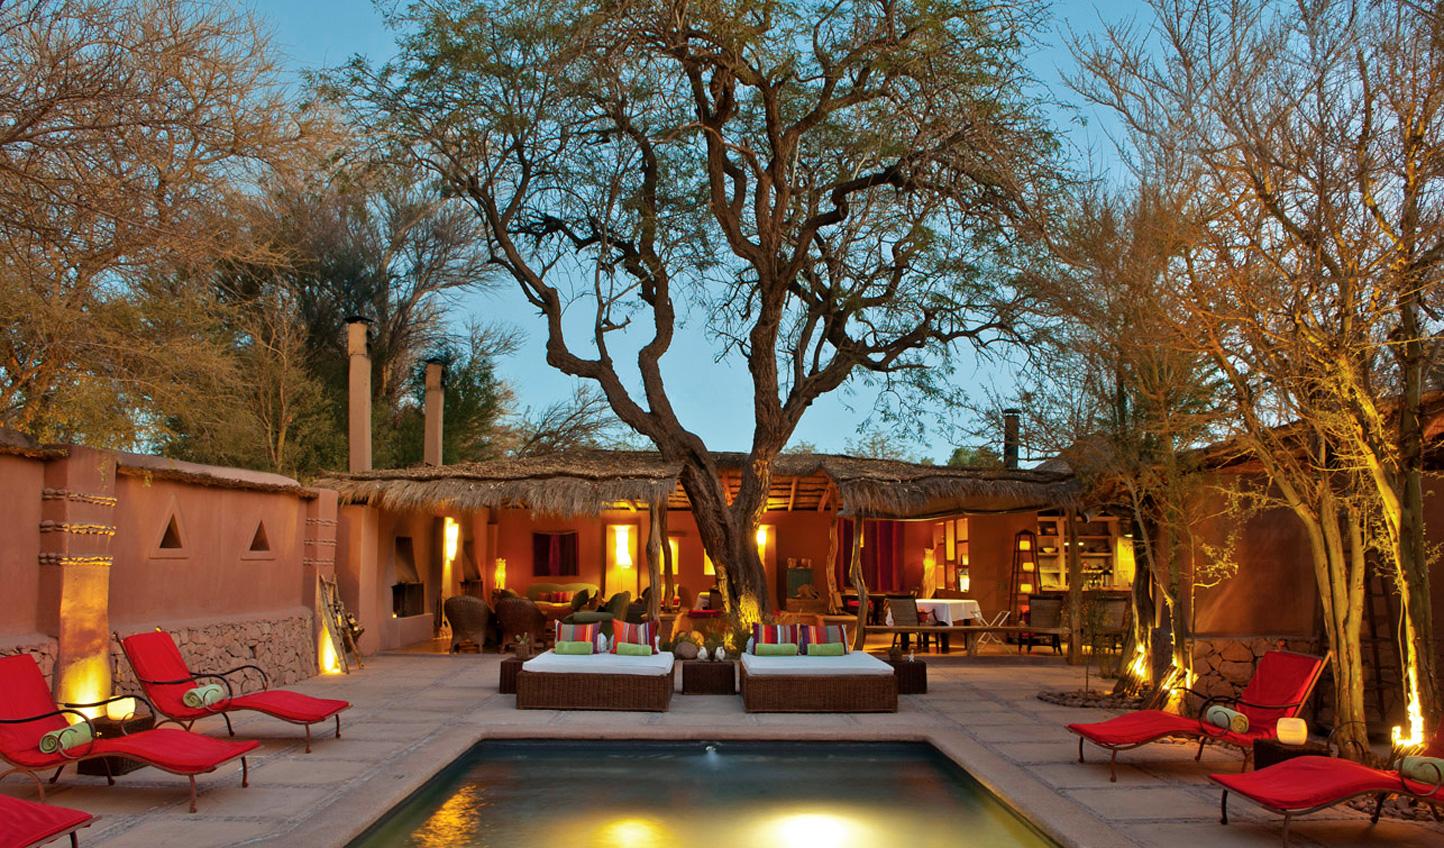 Stay at the luxurious Awasi Hotel in San Pedro de Atacama